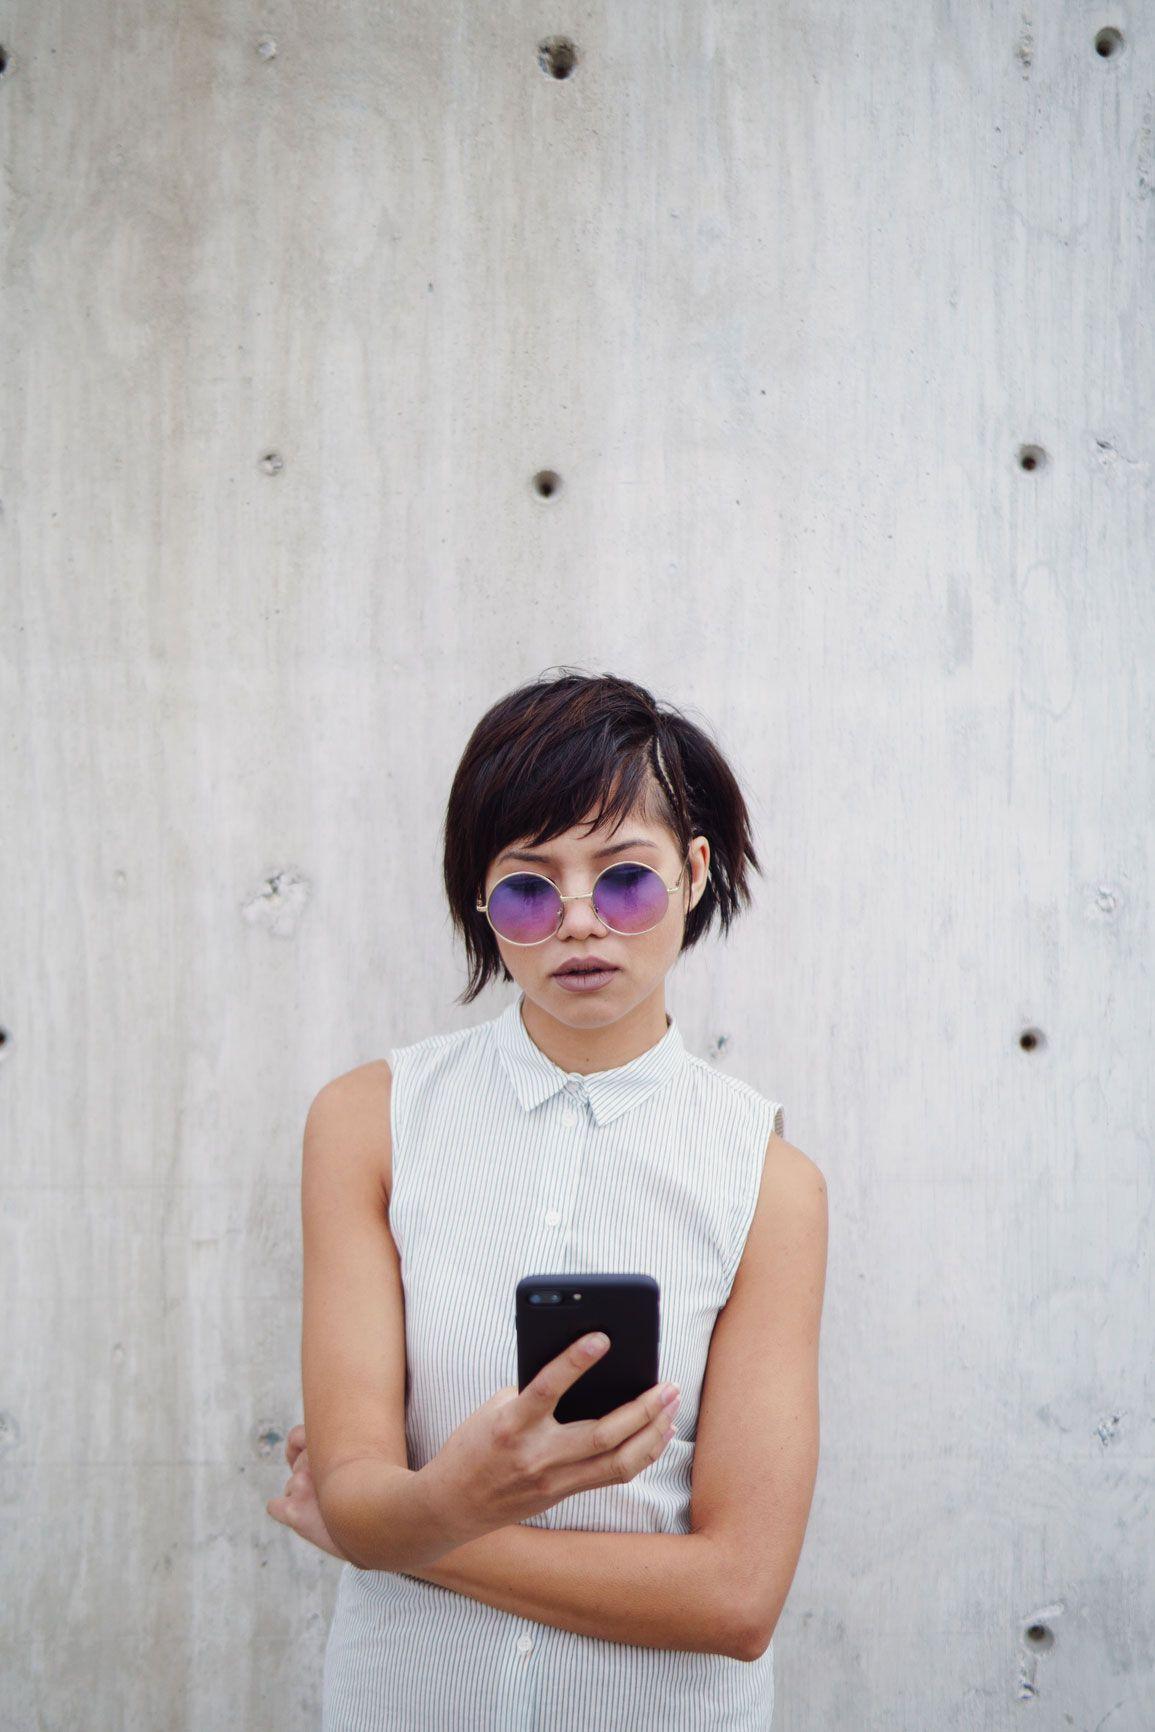 Meeting girl online